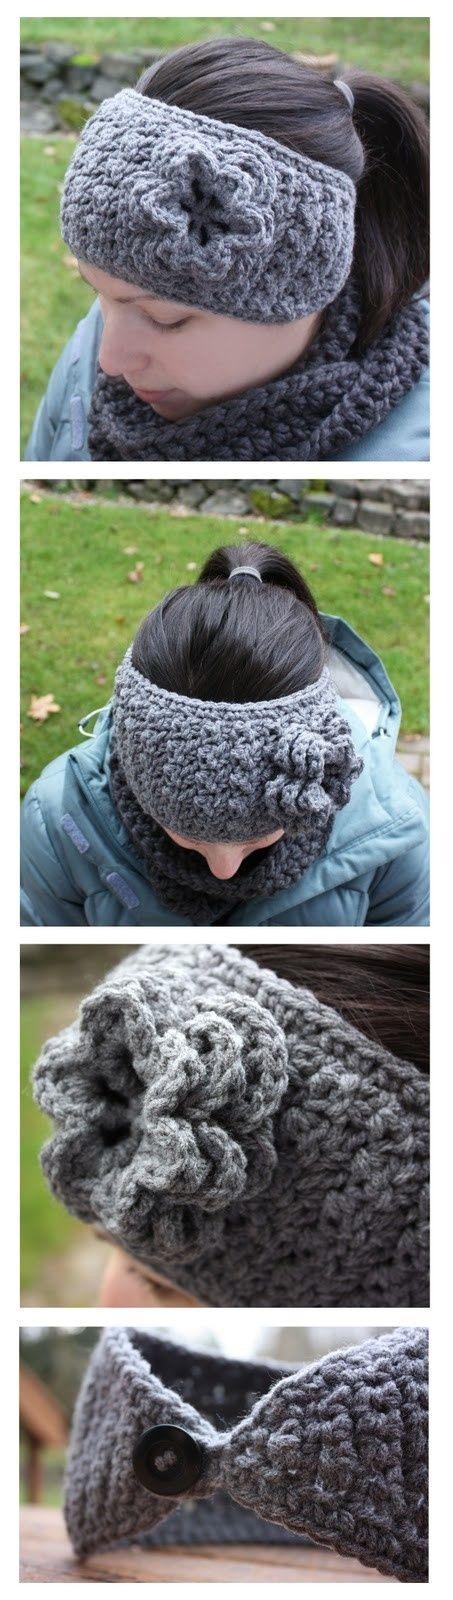 Crochet Winter Headband With Flowers Crochet Winter Crochet And